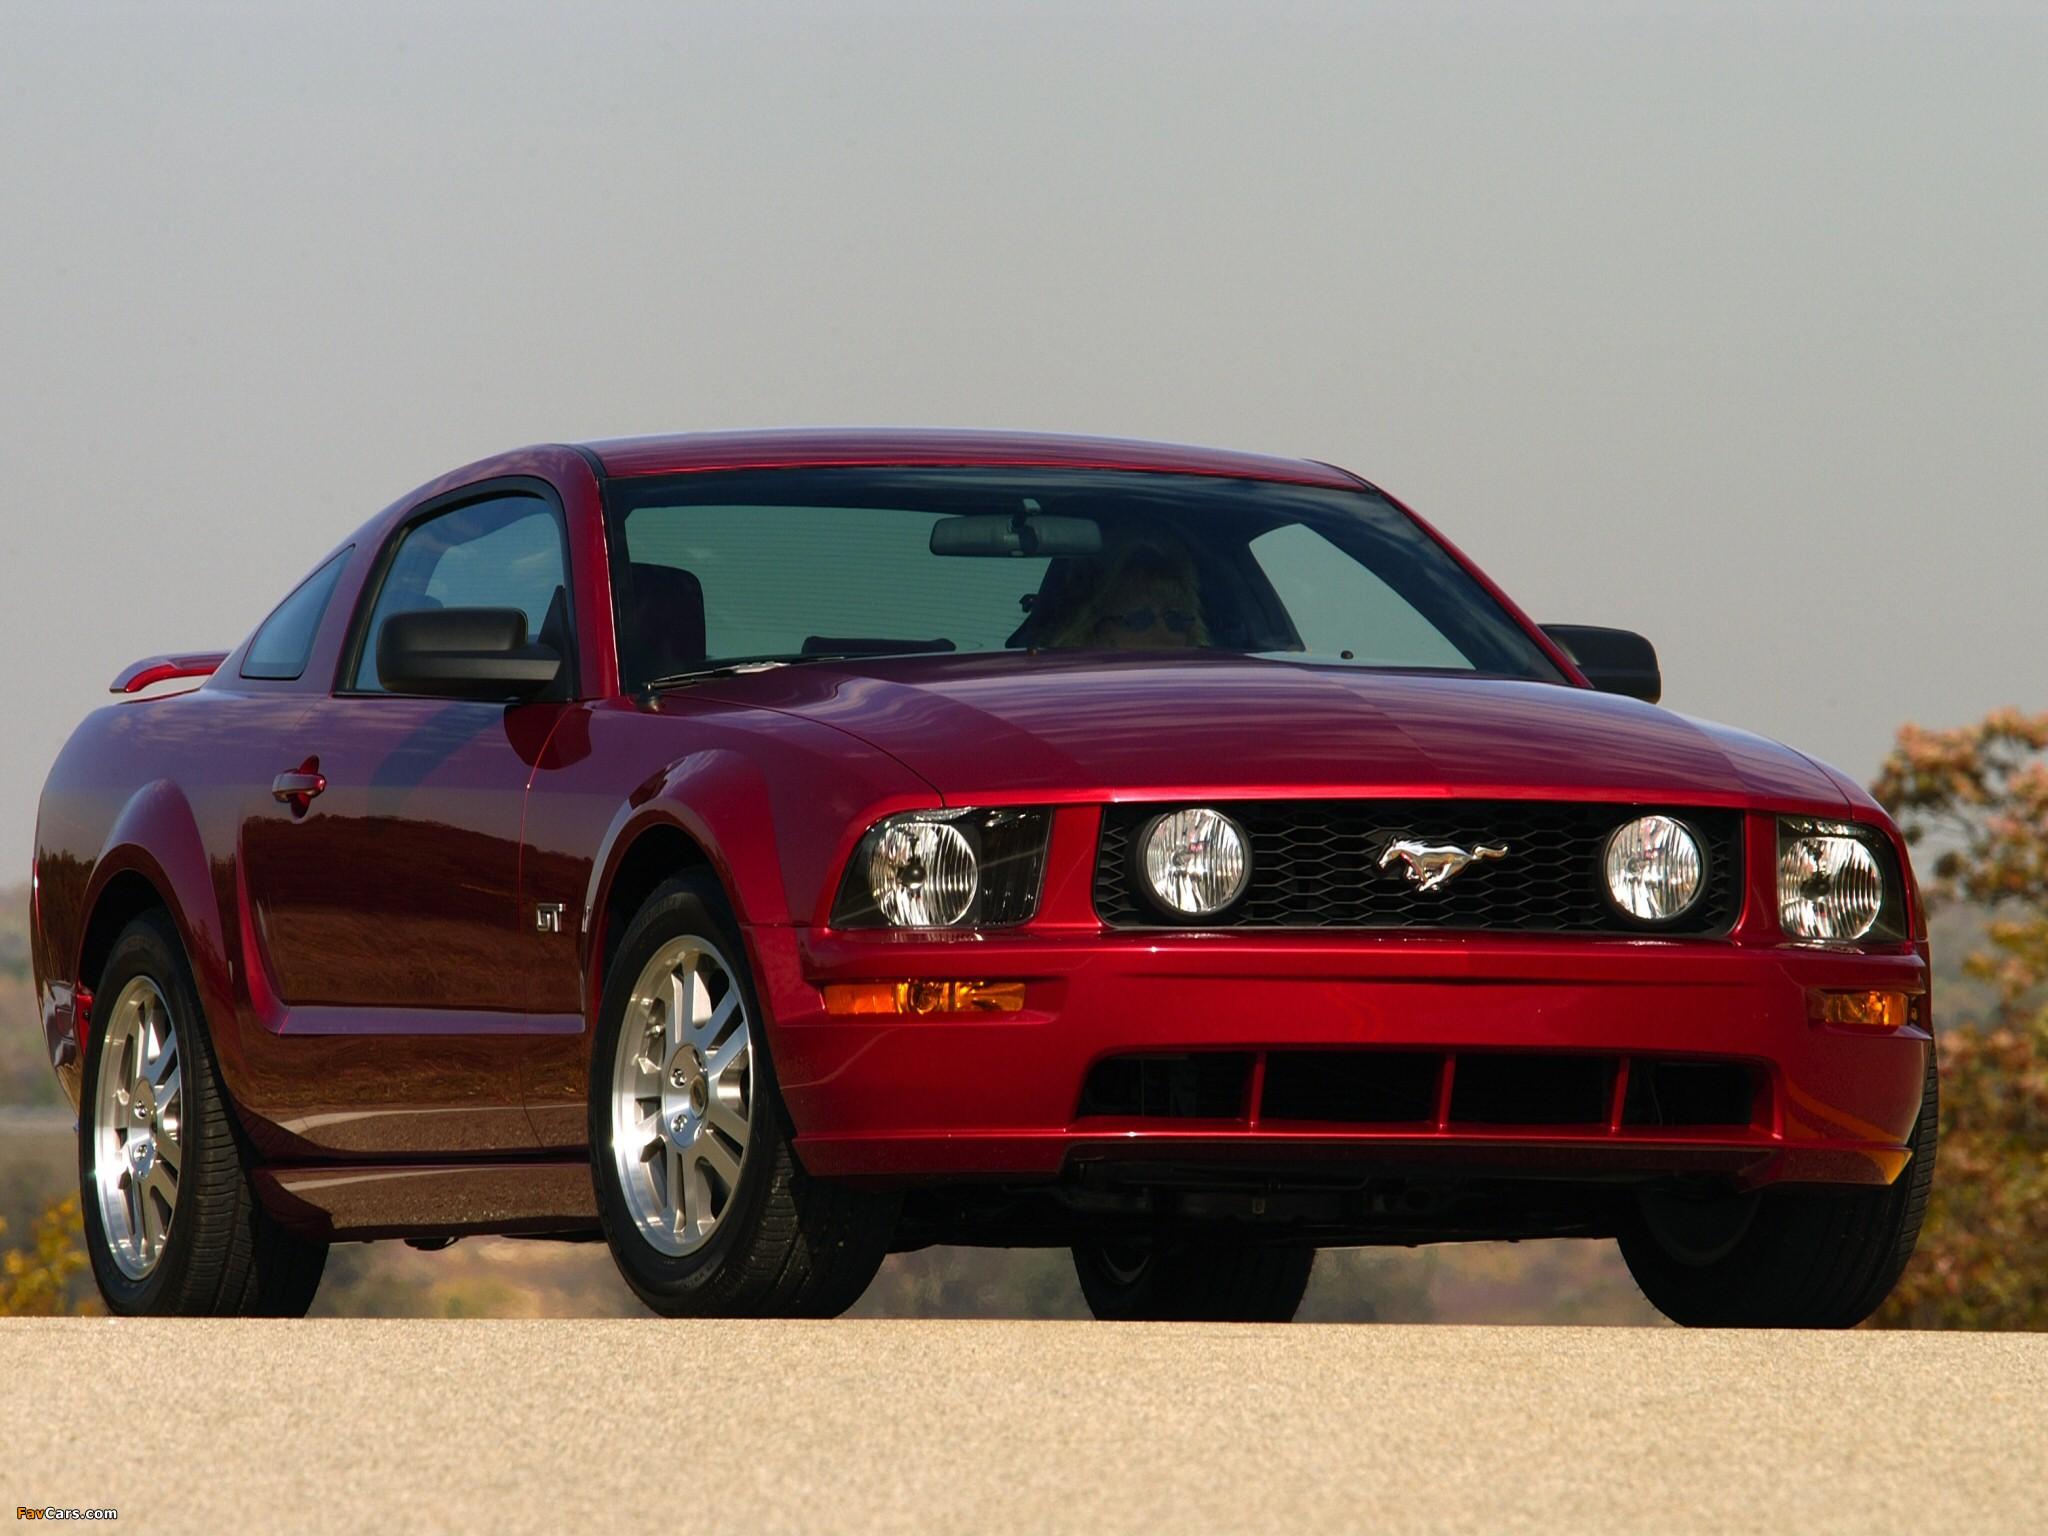 Red Wine Rack Mustang Gt 2005 08 Wallpapers 2048x1536